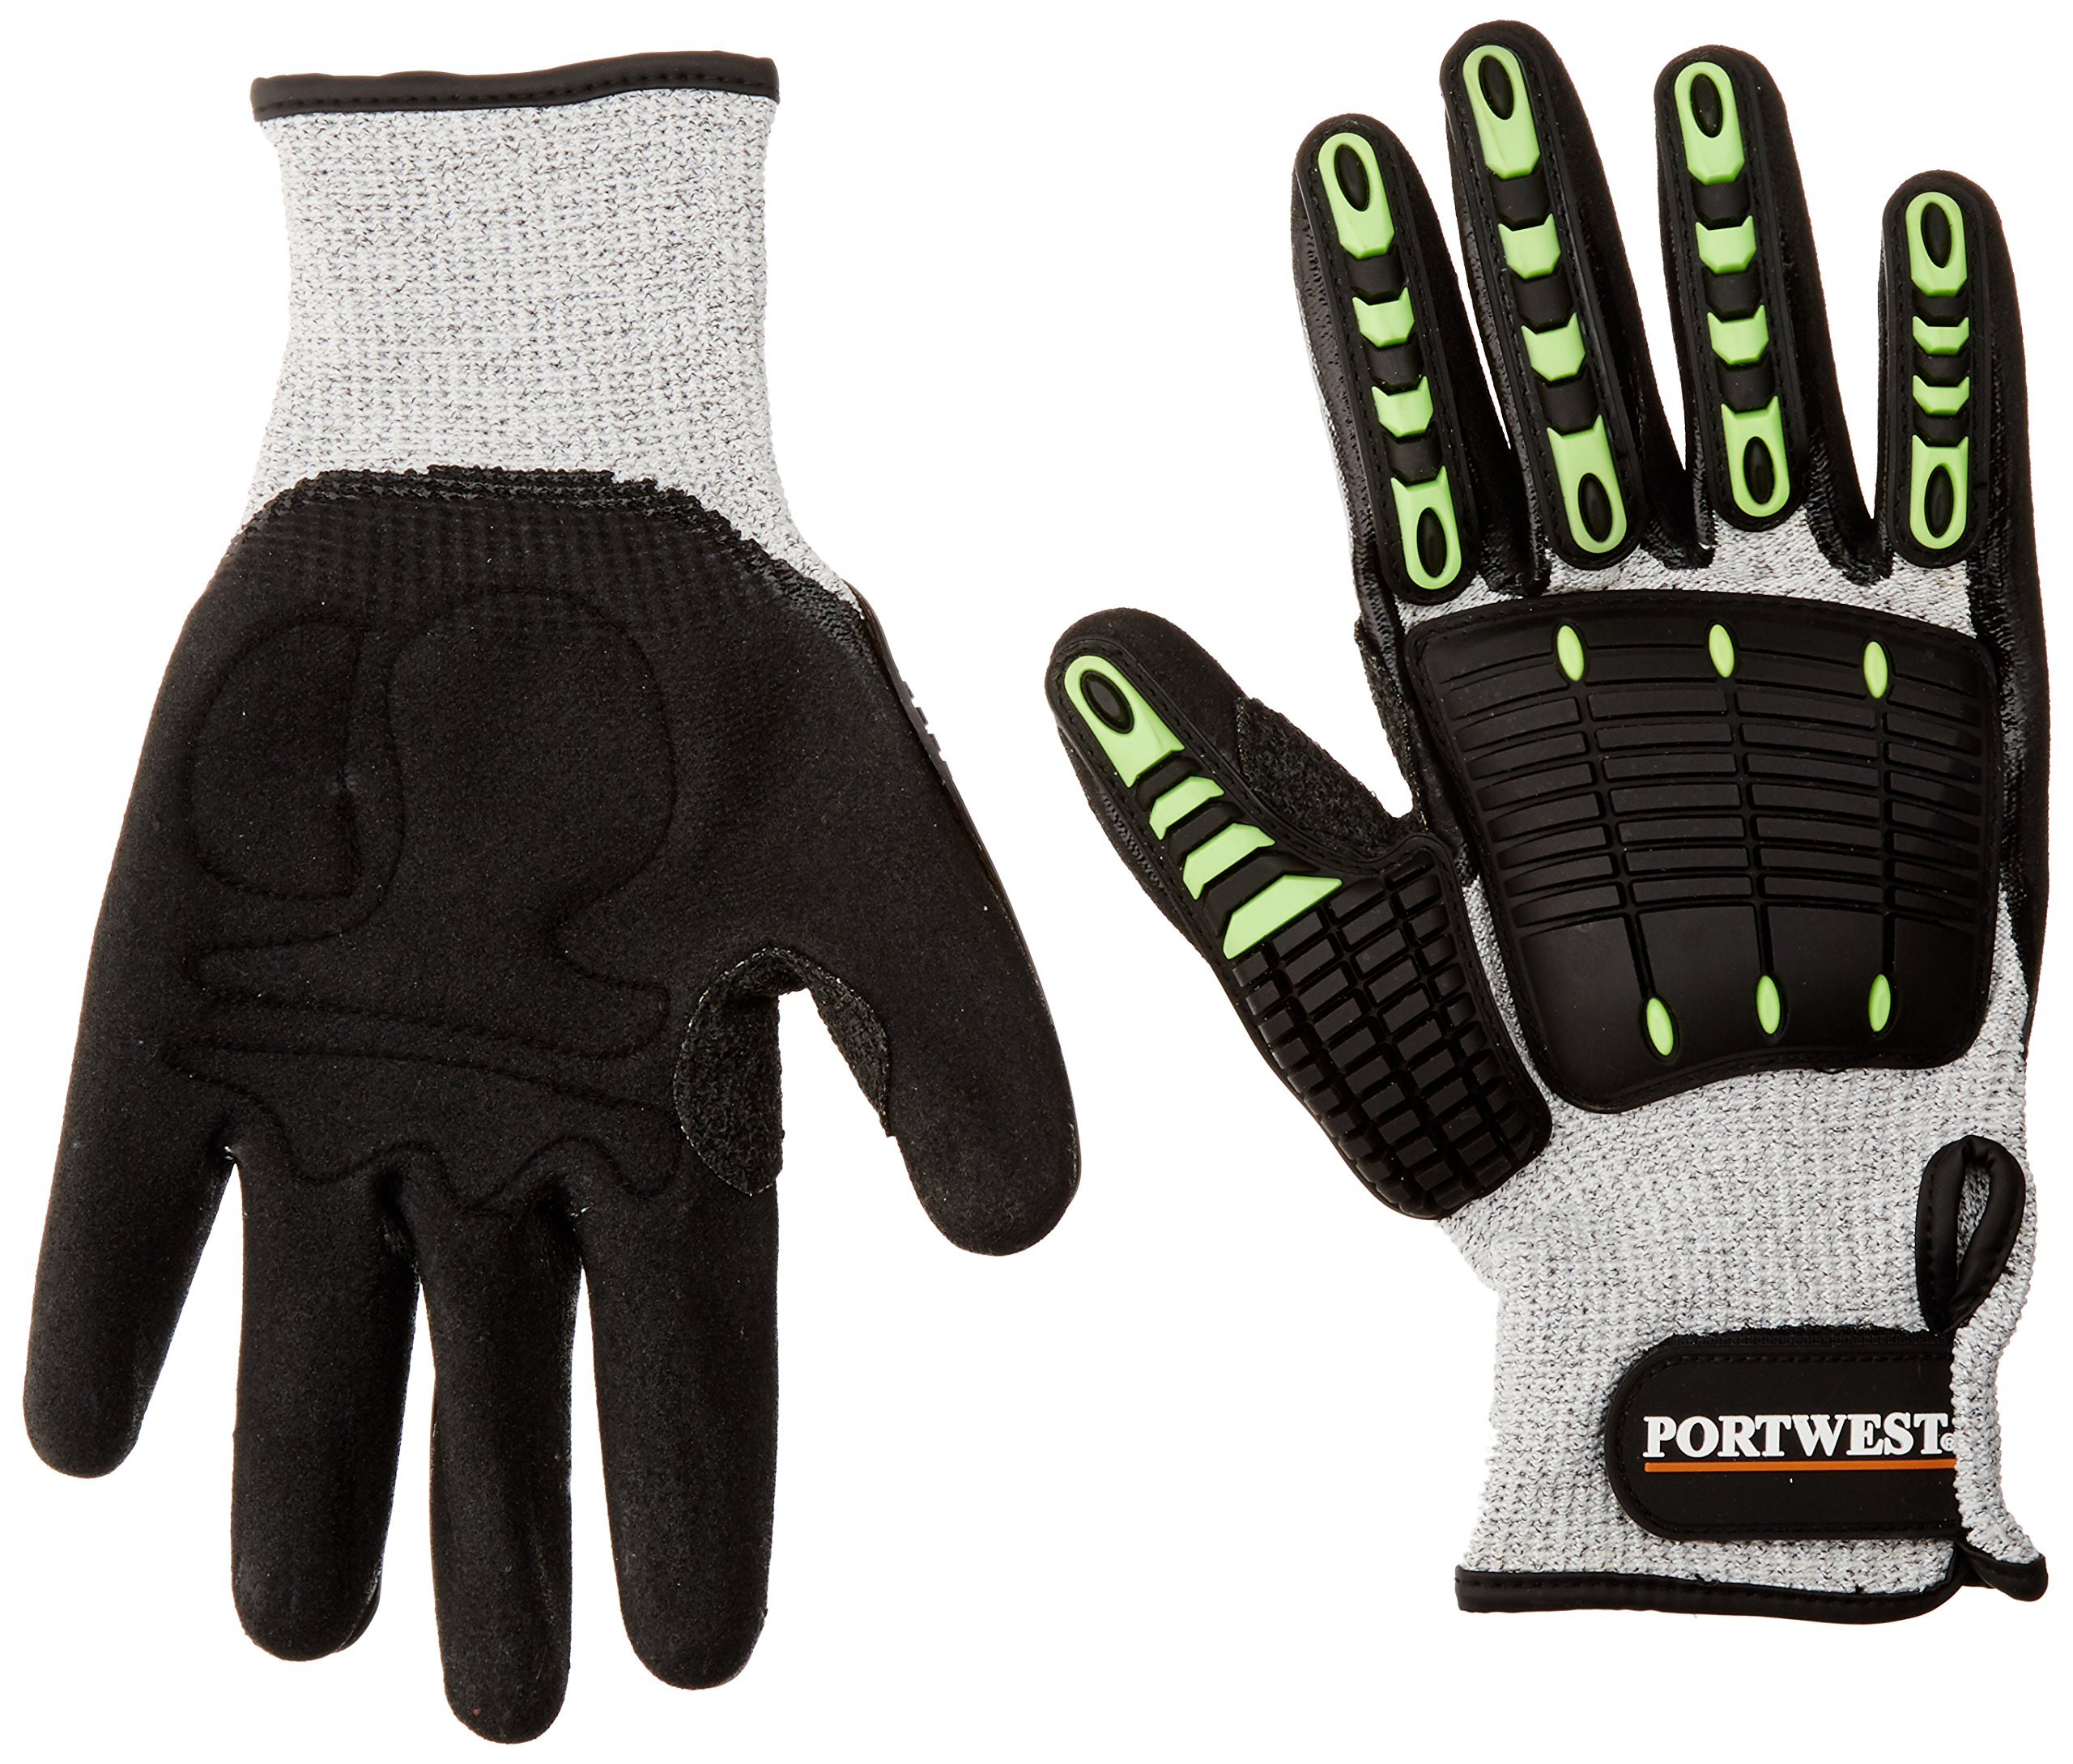 Portwest A722 Anti Impact Cut Resistant Glove, Large by Portwest (Image #1)